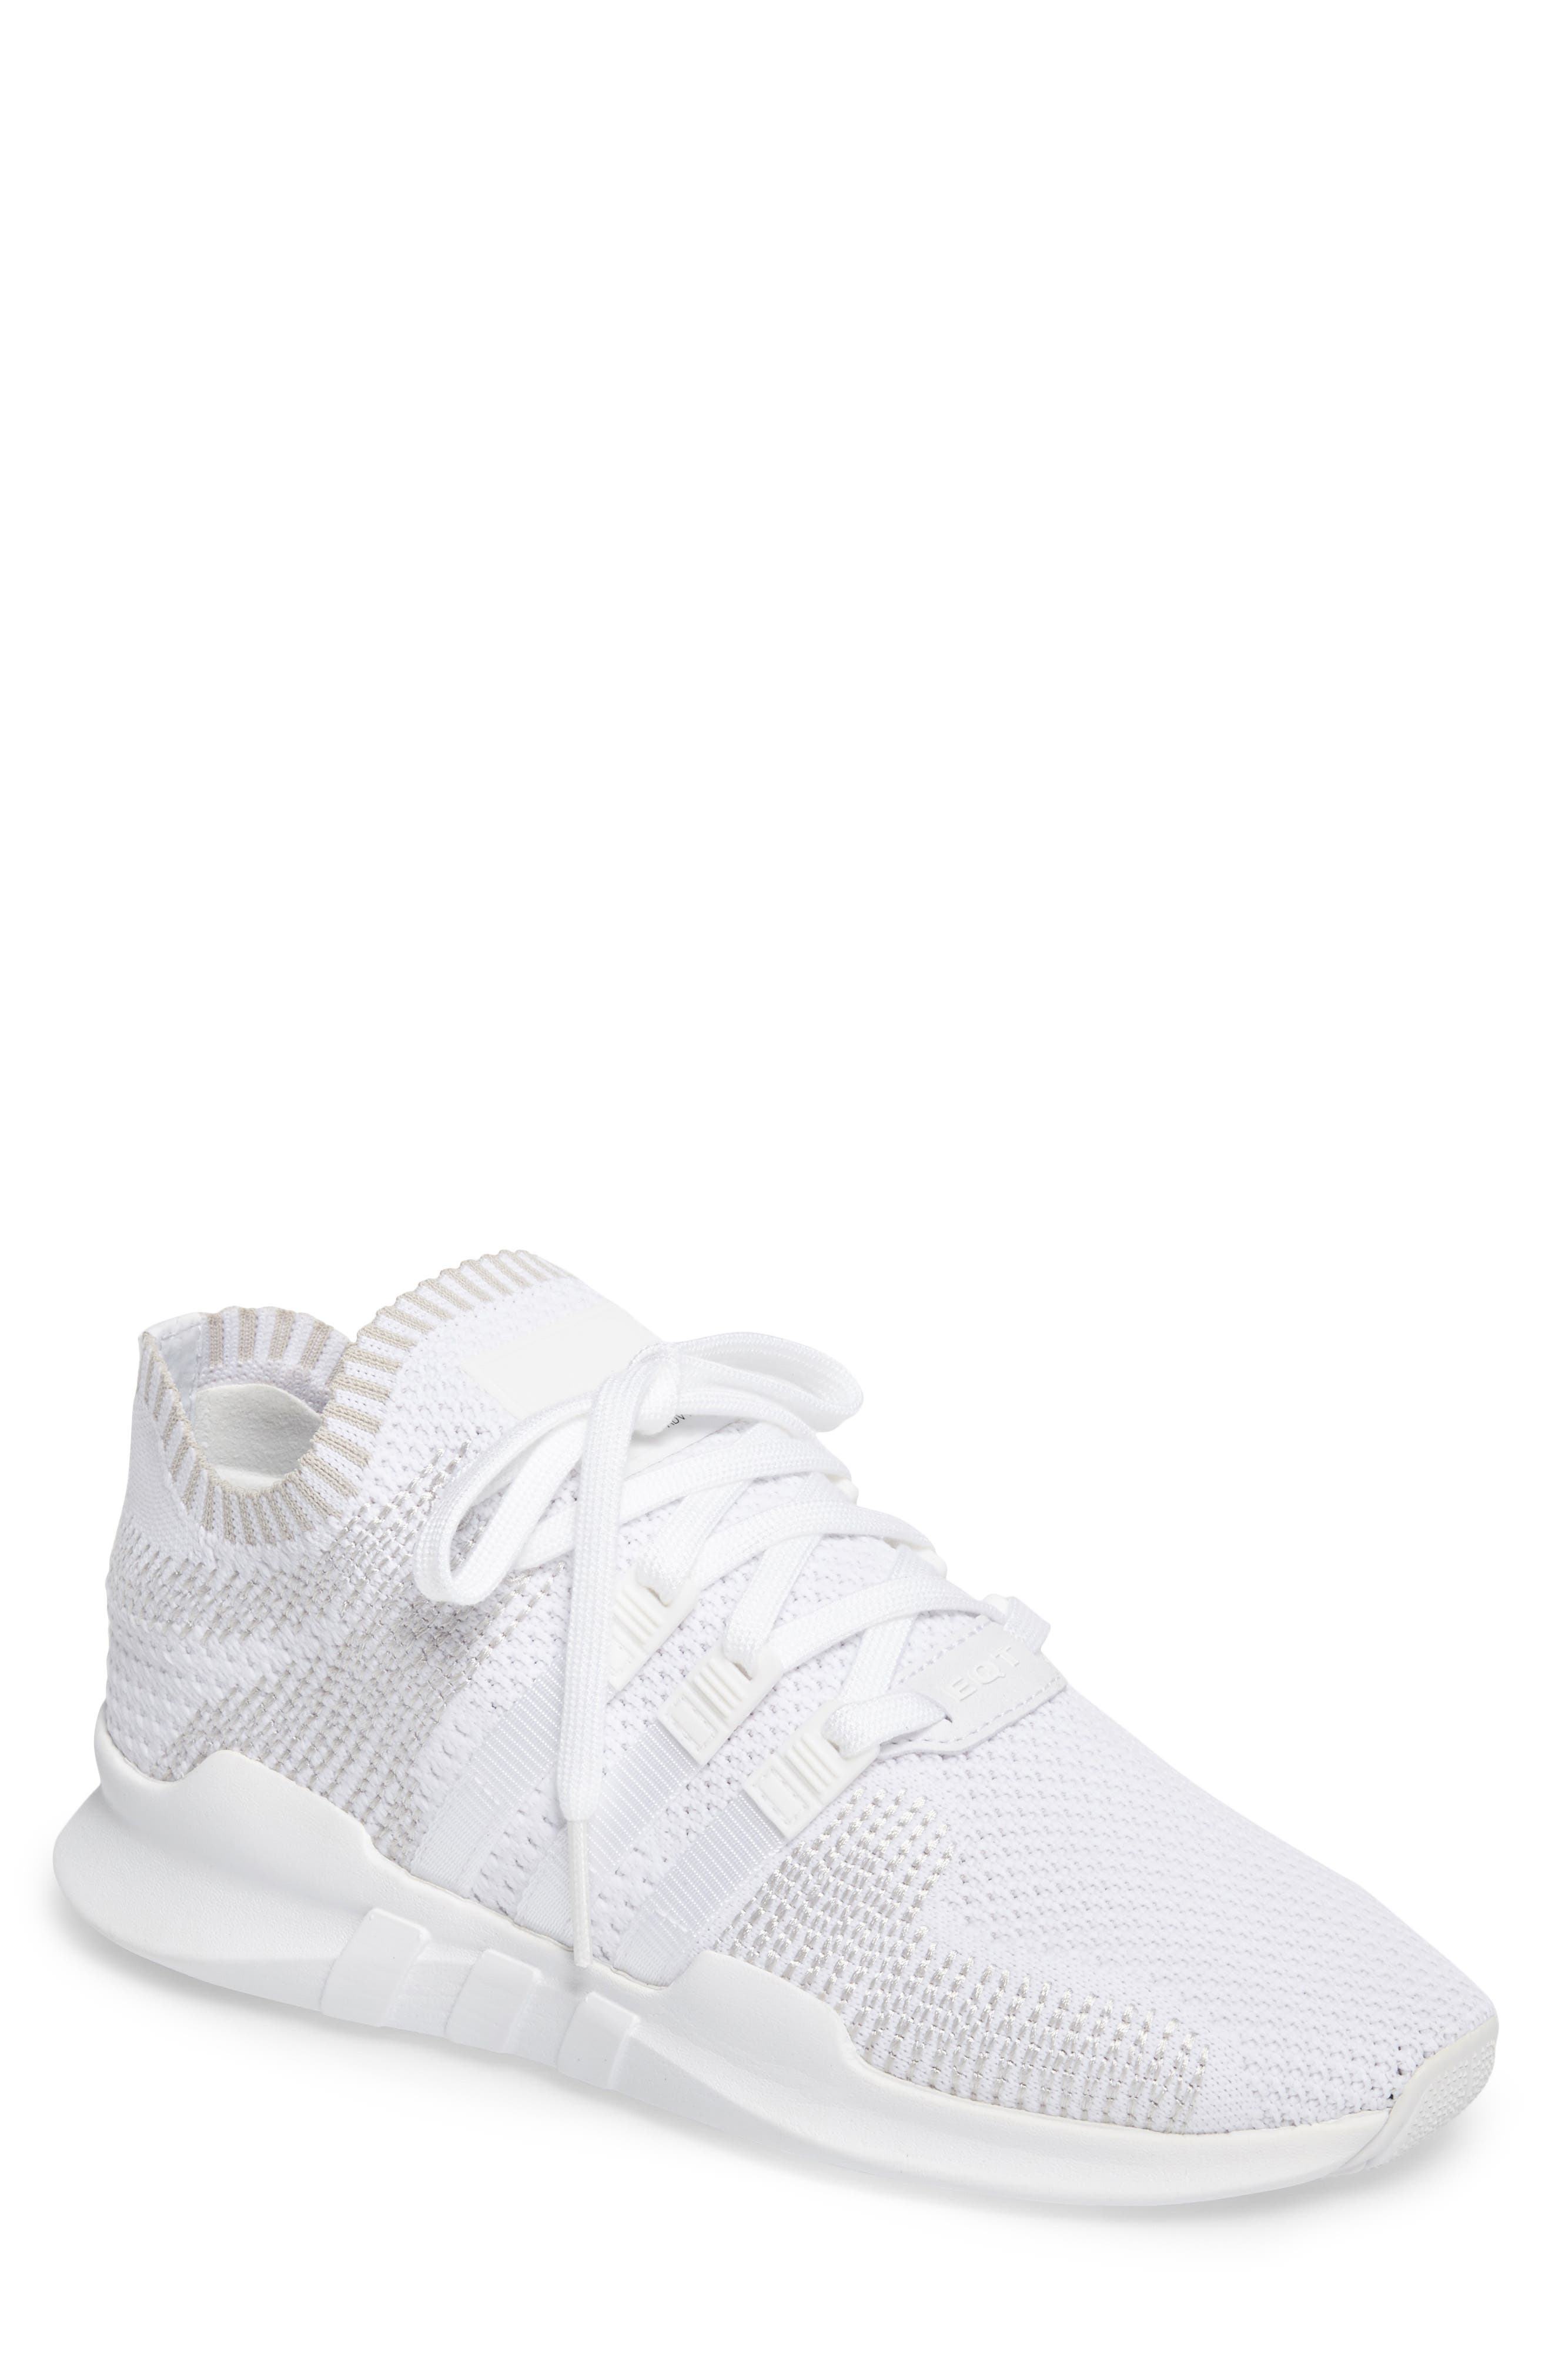 EQT Support ADV PrimeKnit Sneaker,                             Main thumbnail 2, color,